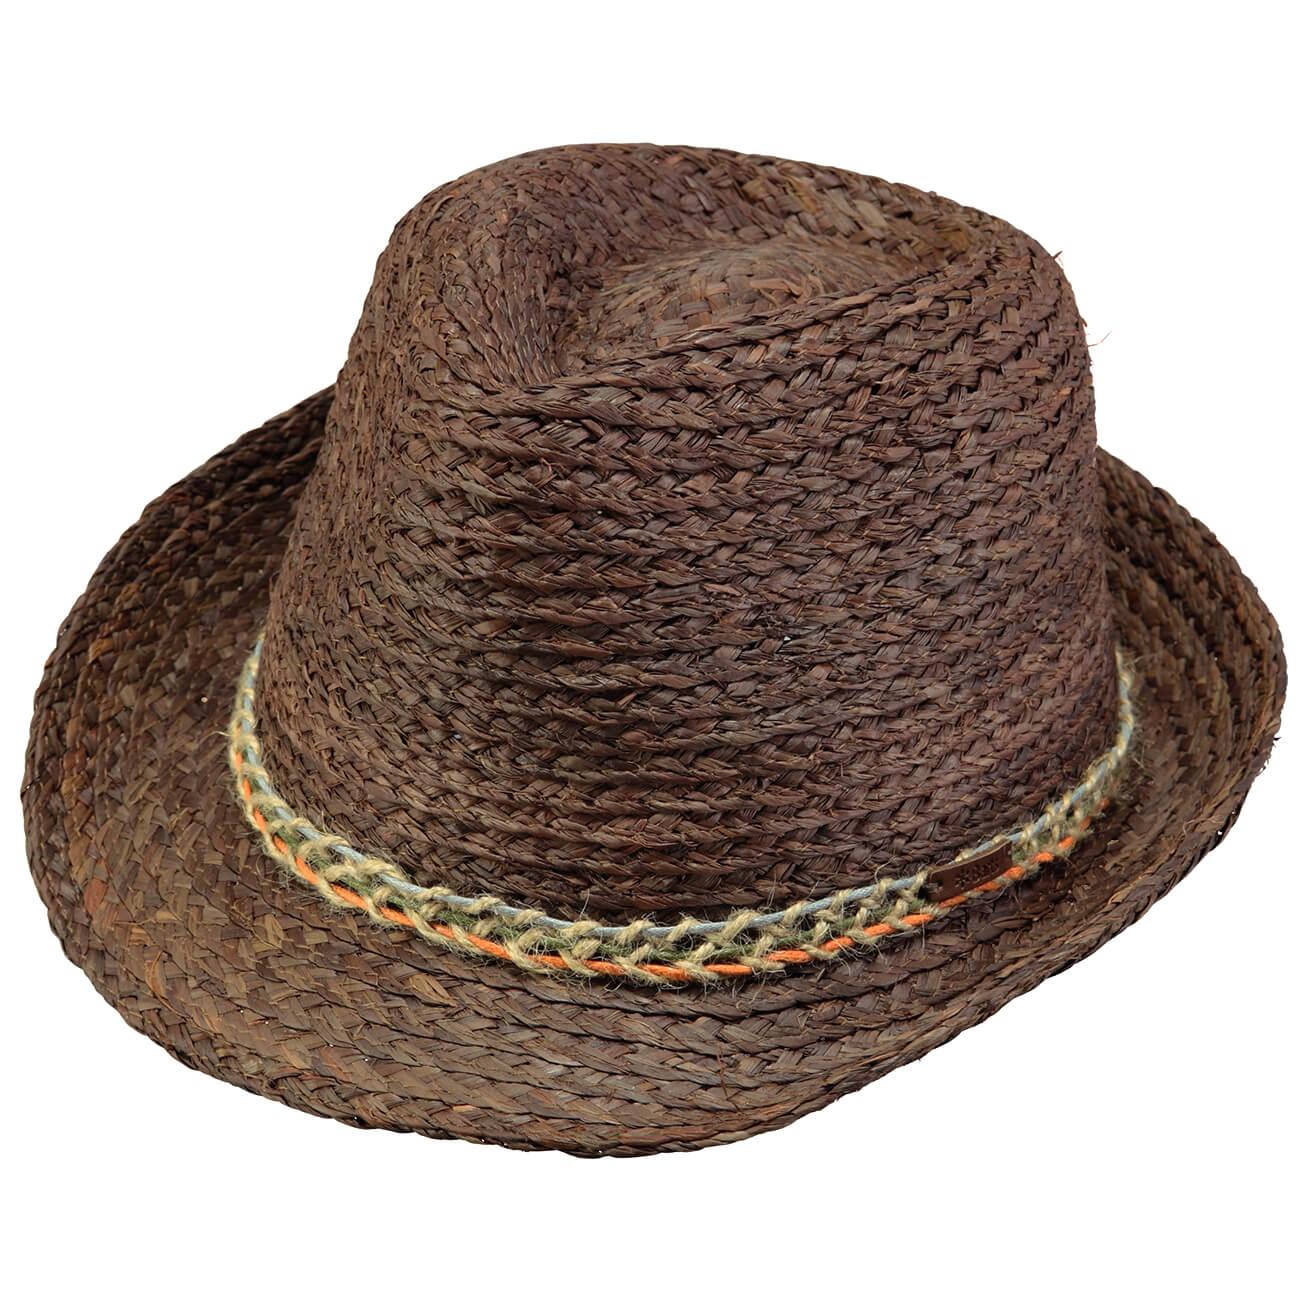 5c67aae02b3 Barts Taco Hat - Hat